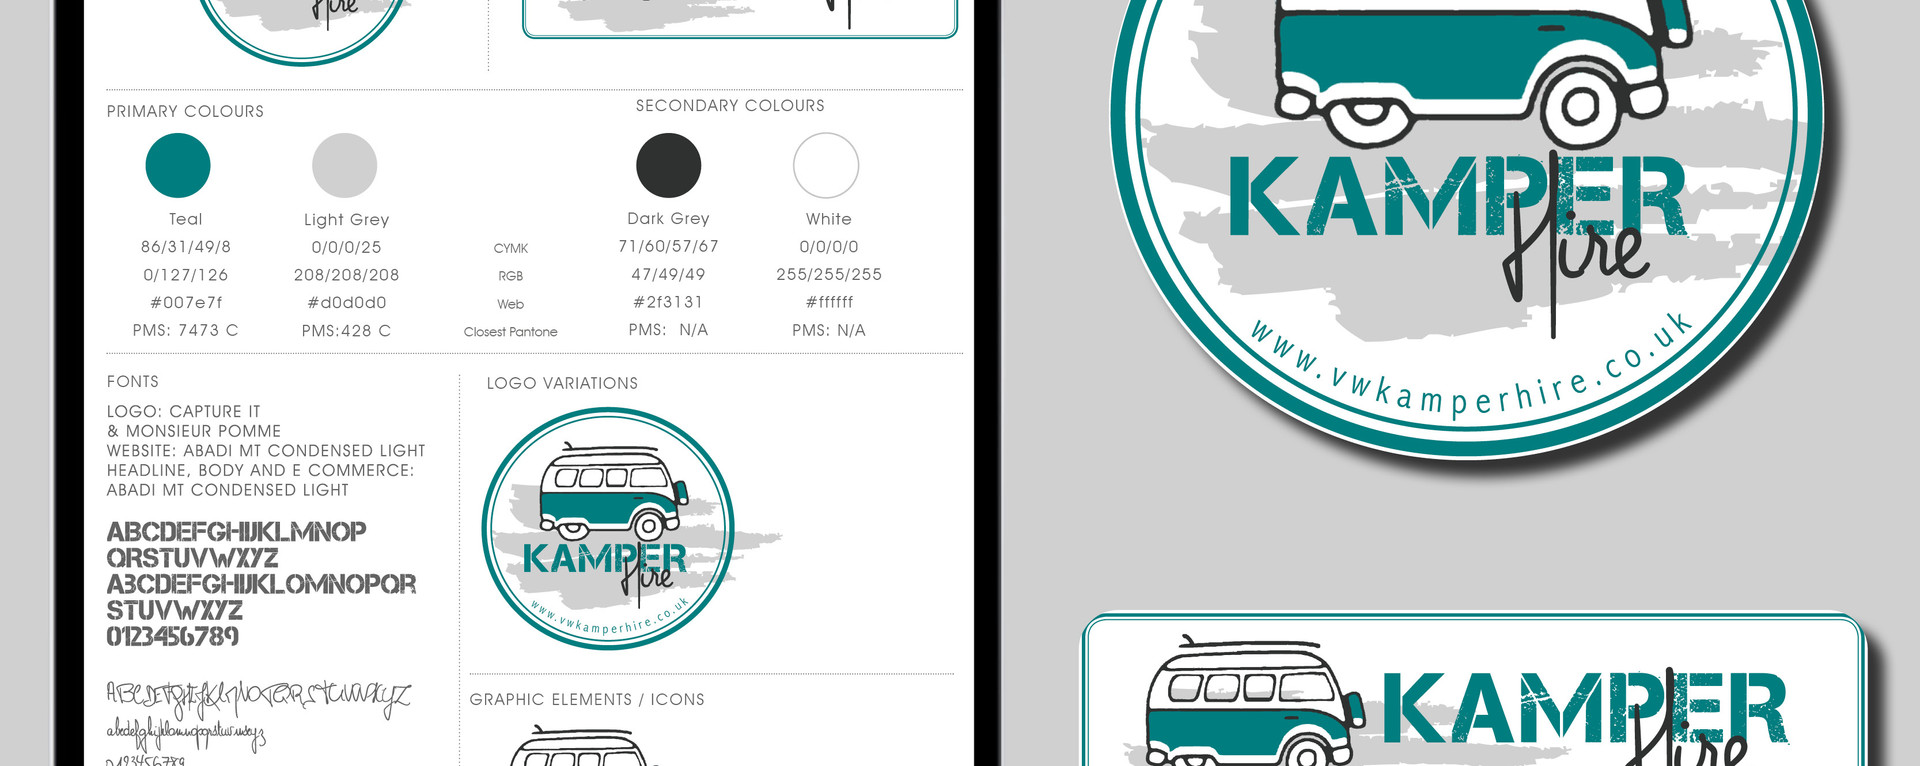 NEW BRAND DESIGN | KAMPER HIRE